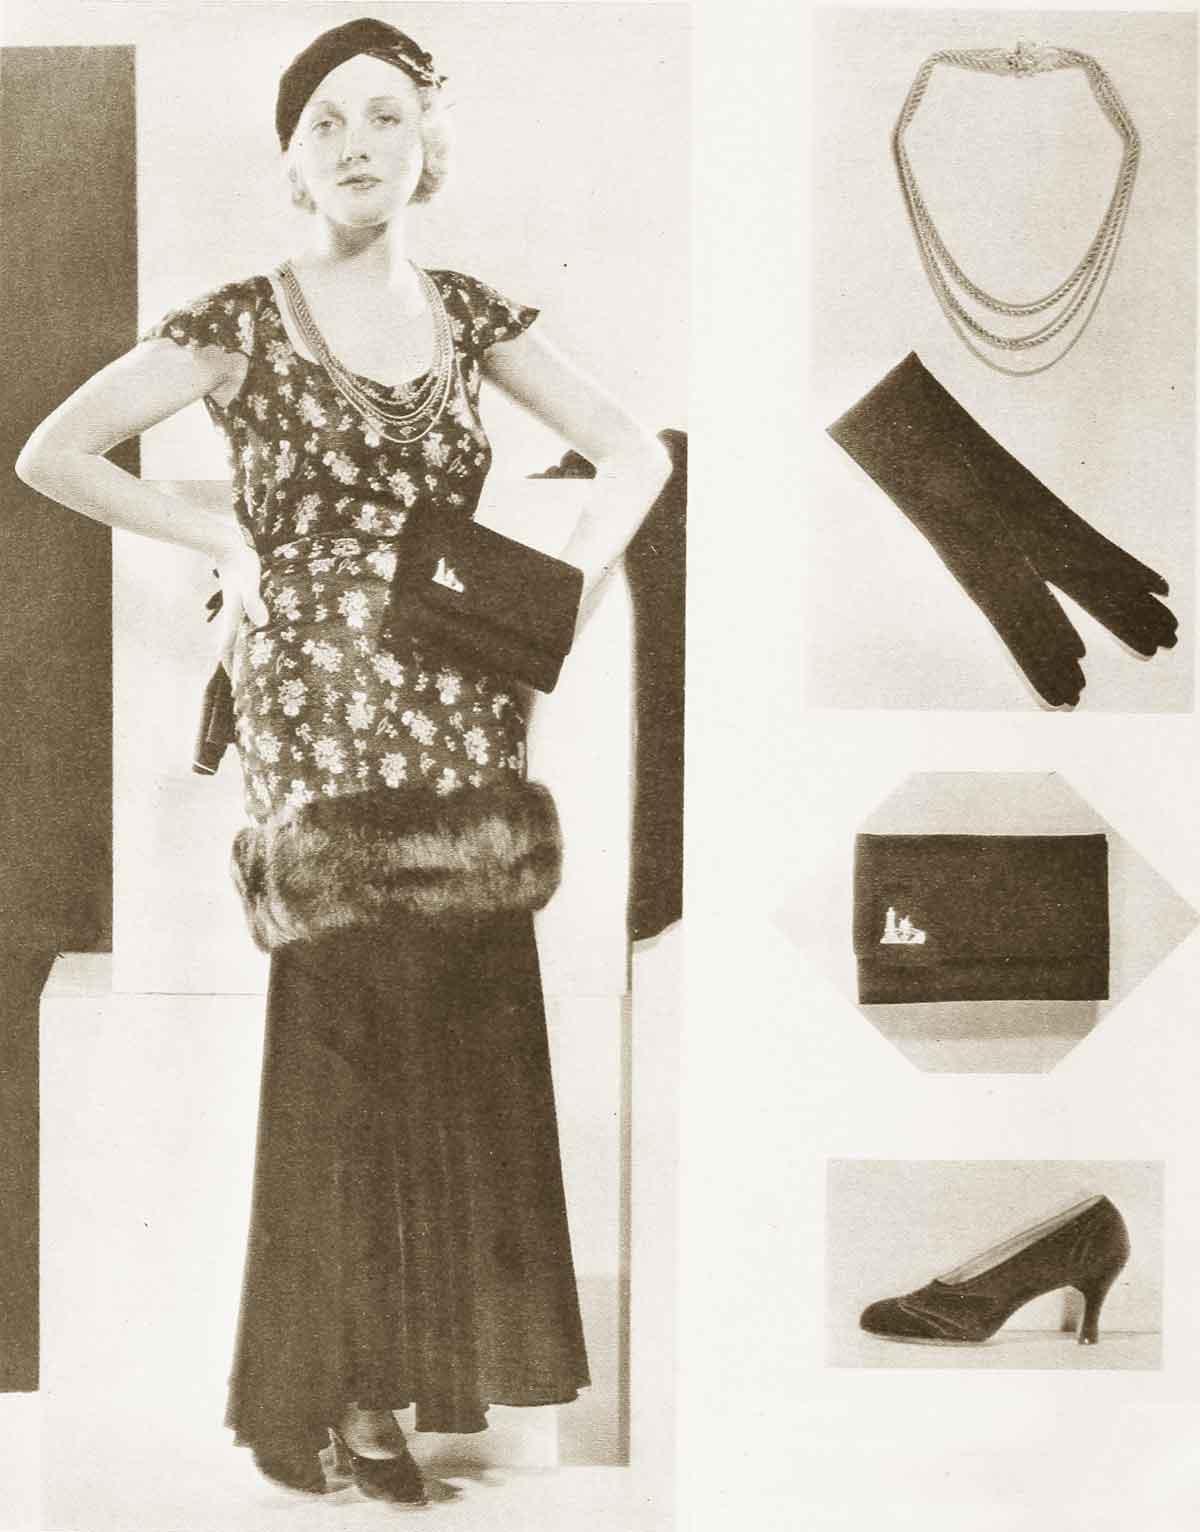 1930s-Fashion---A-Study-in-Accessories---Supper-Ensemble